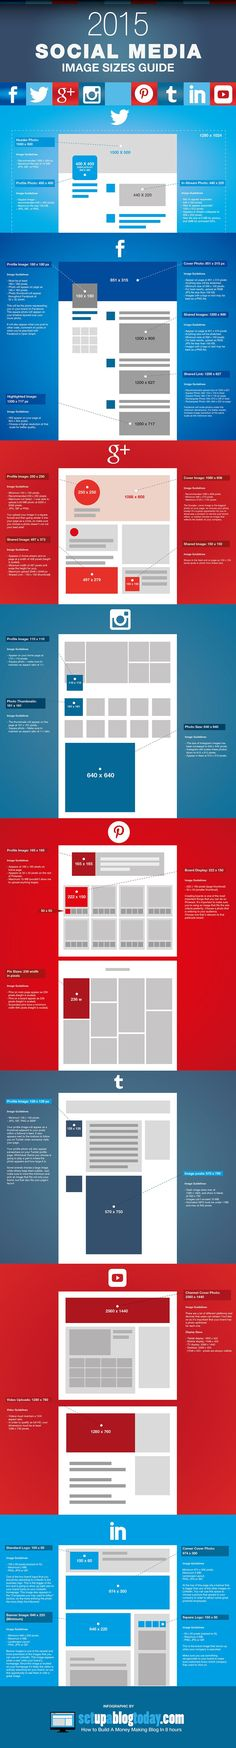 2015: Complete #SocialMedia Image Dimensions Guide - #infographic